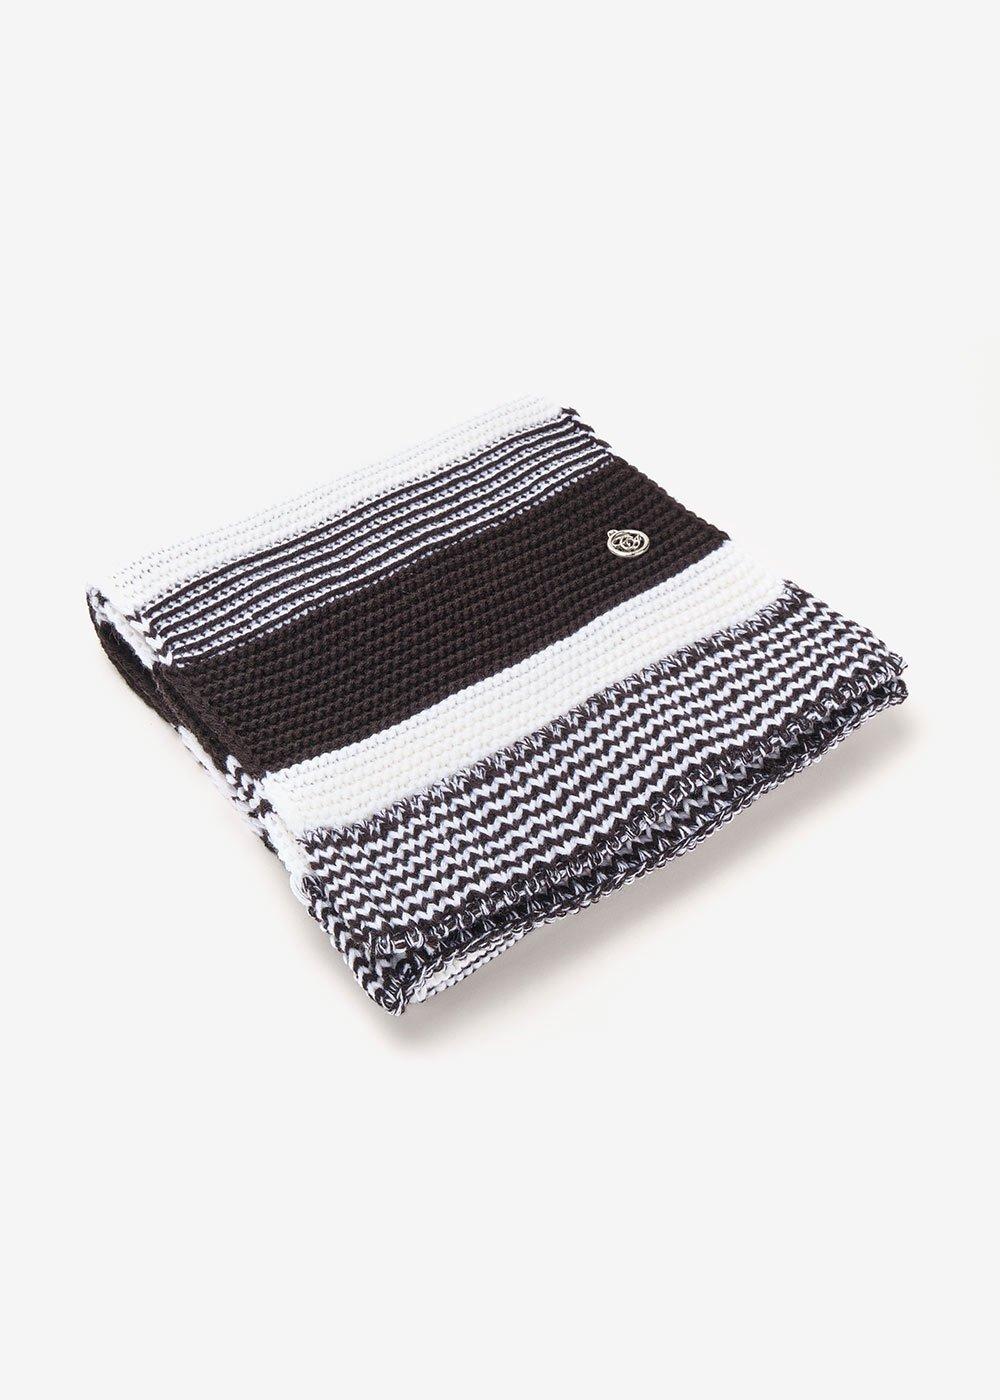 Sciarpa Sharen bi color black&white - Black / White Stripes - Donna